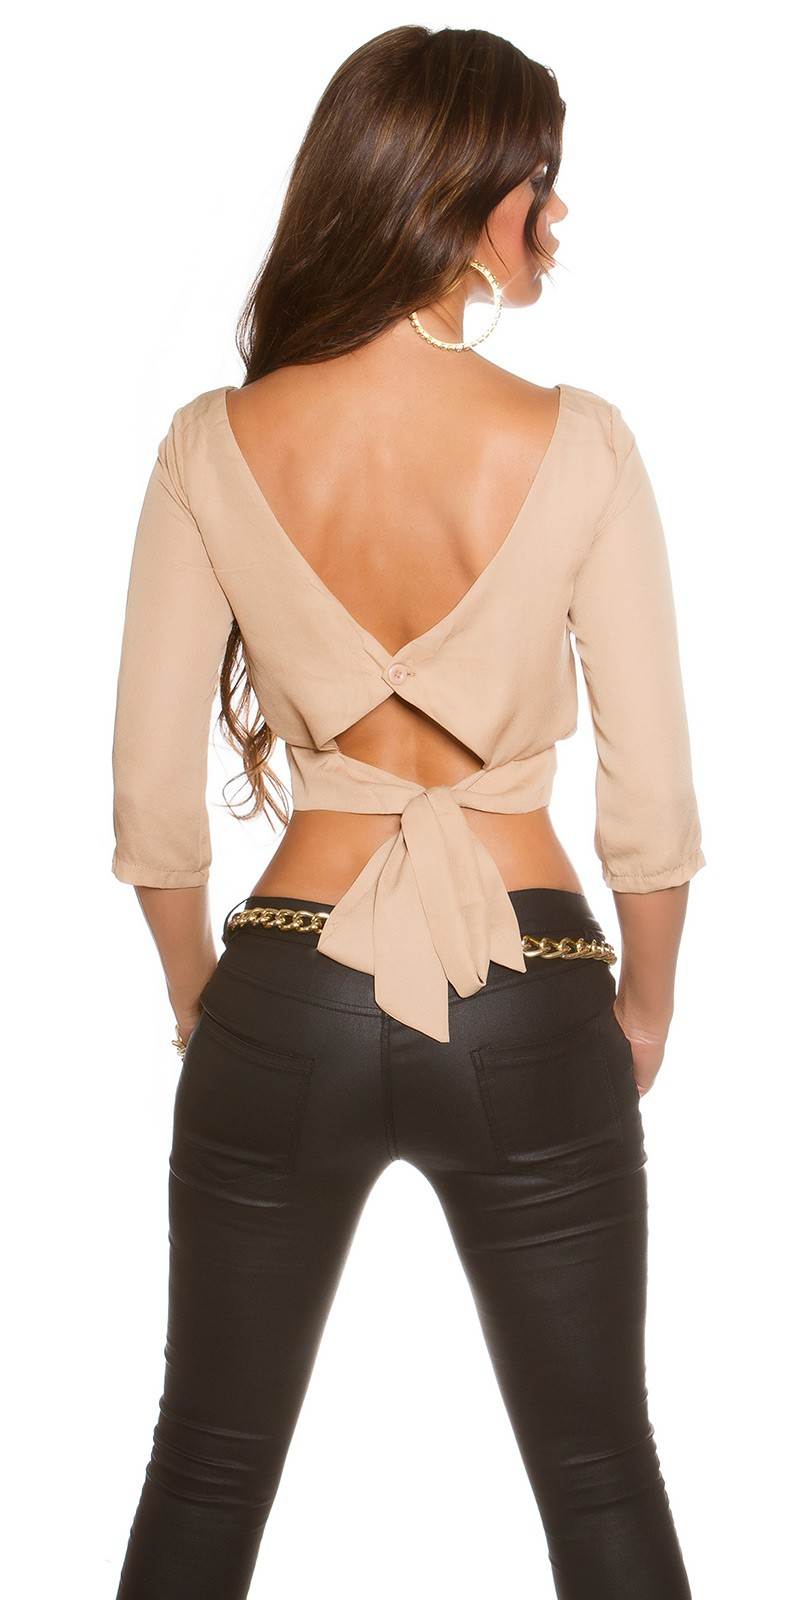 Bluze scurte cu spatele gol la moda